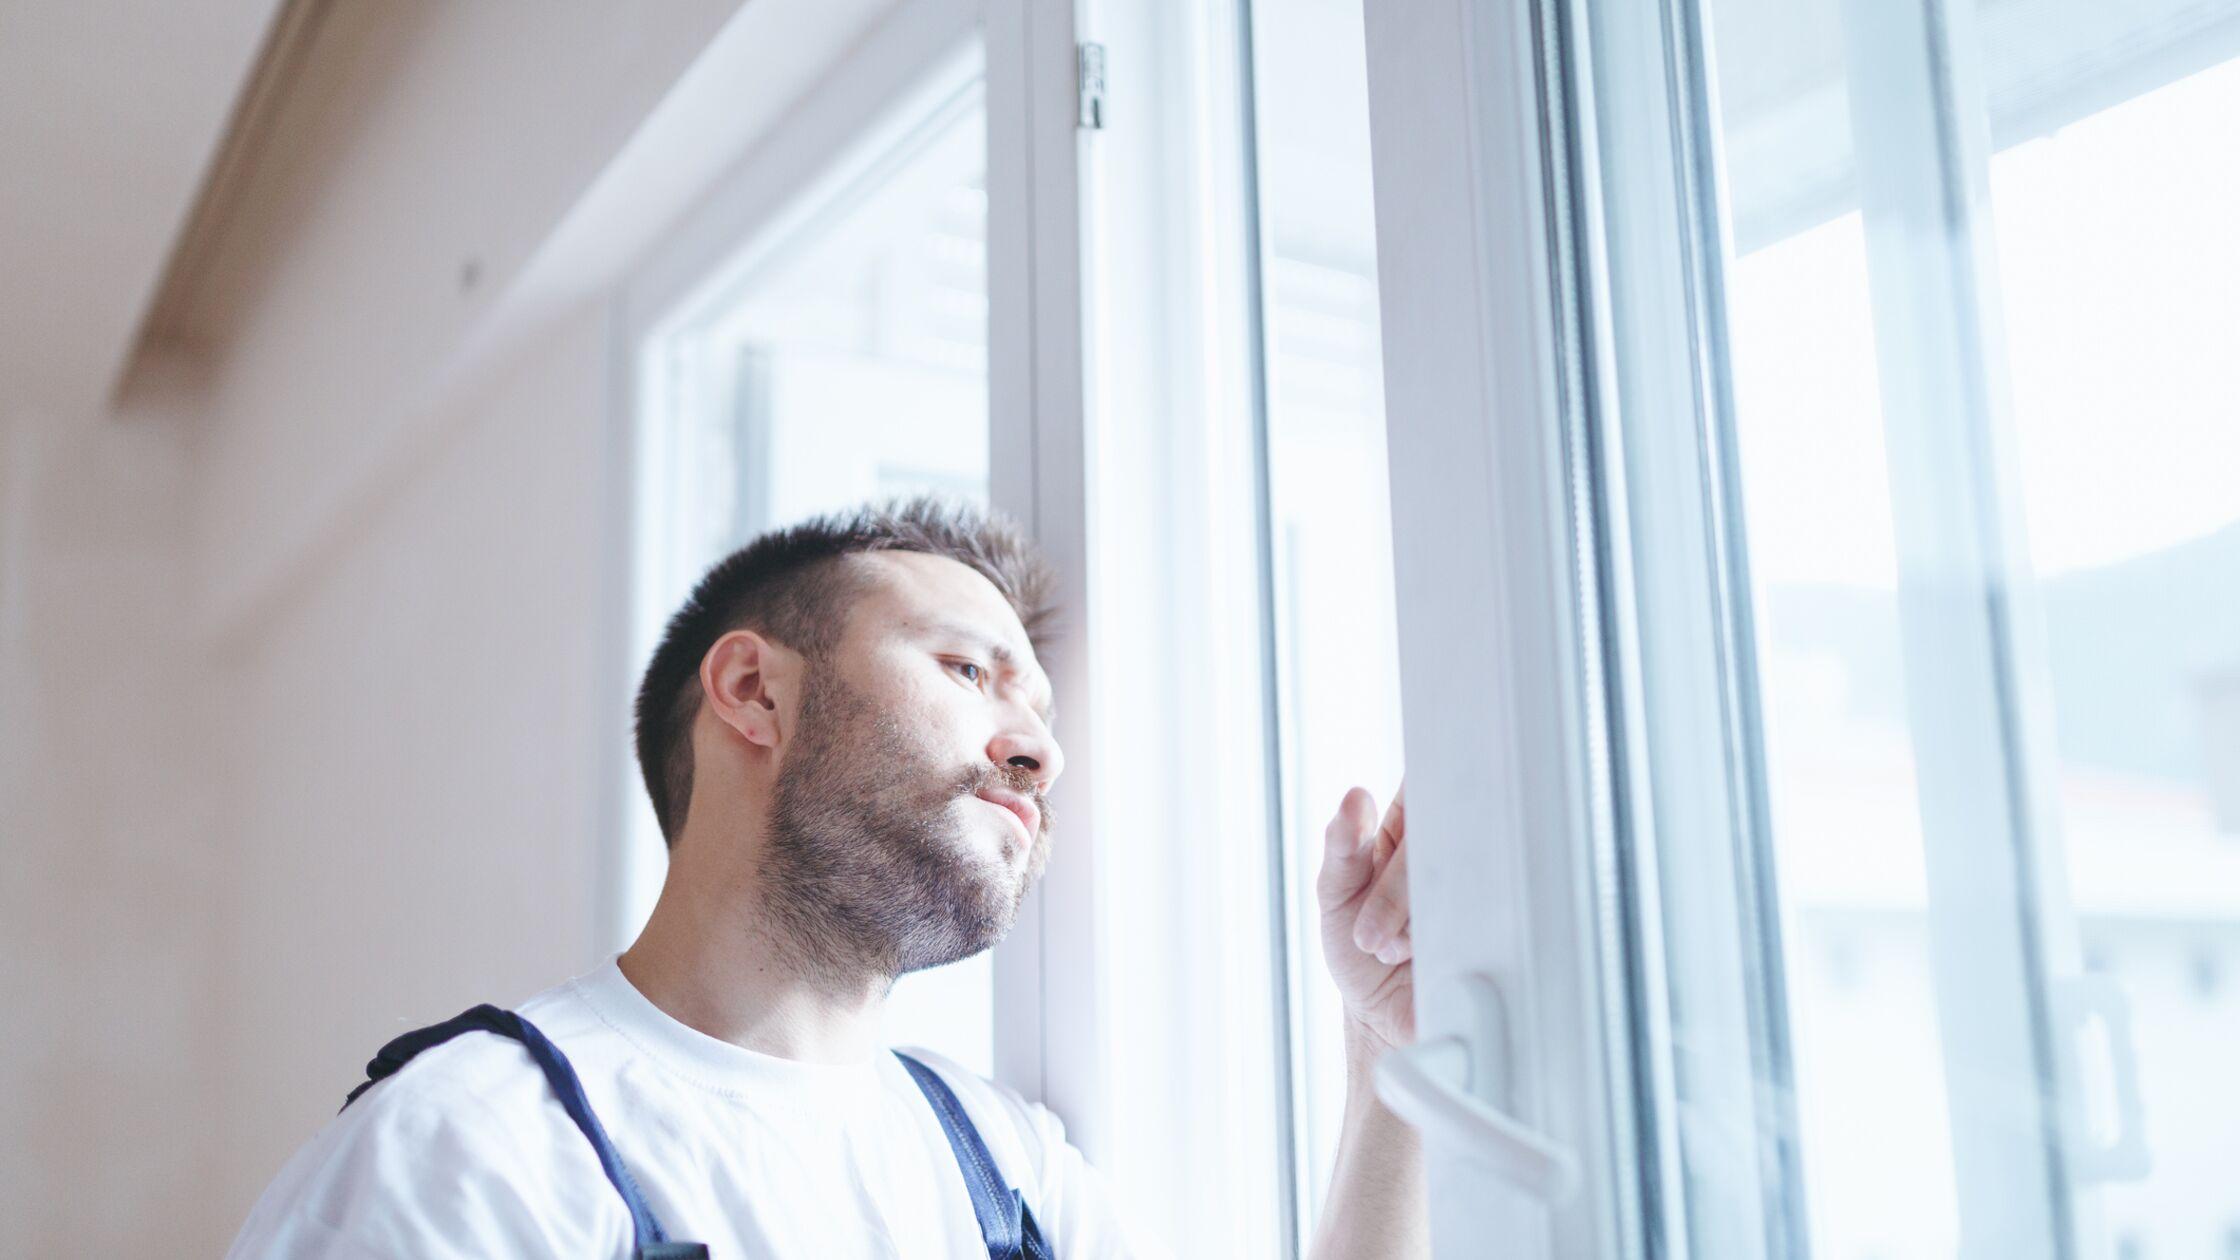 Handwerker repariert Fenster